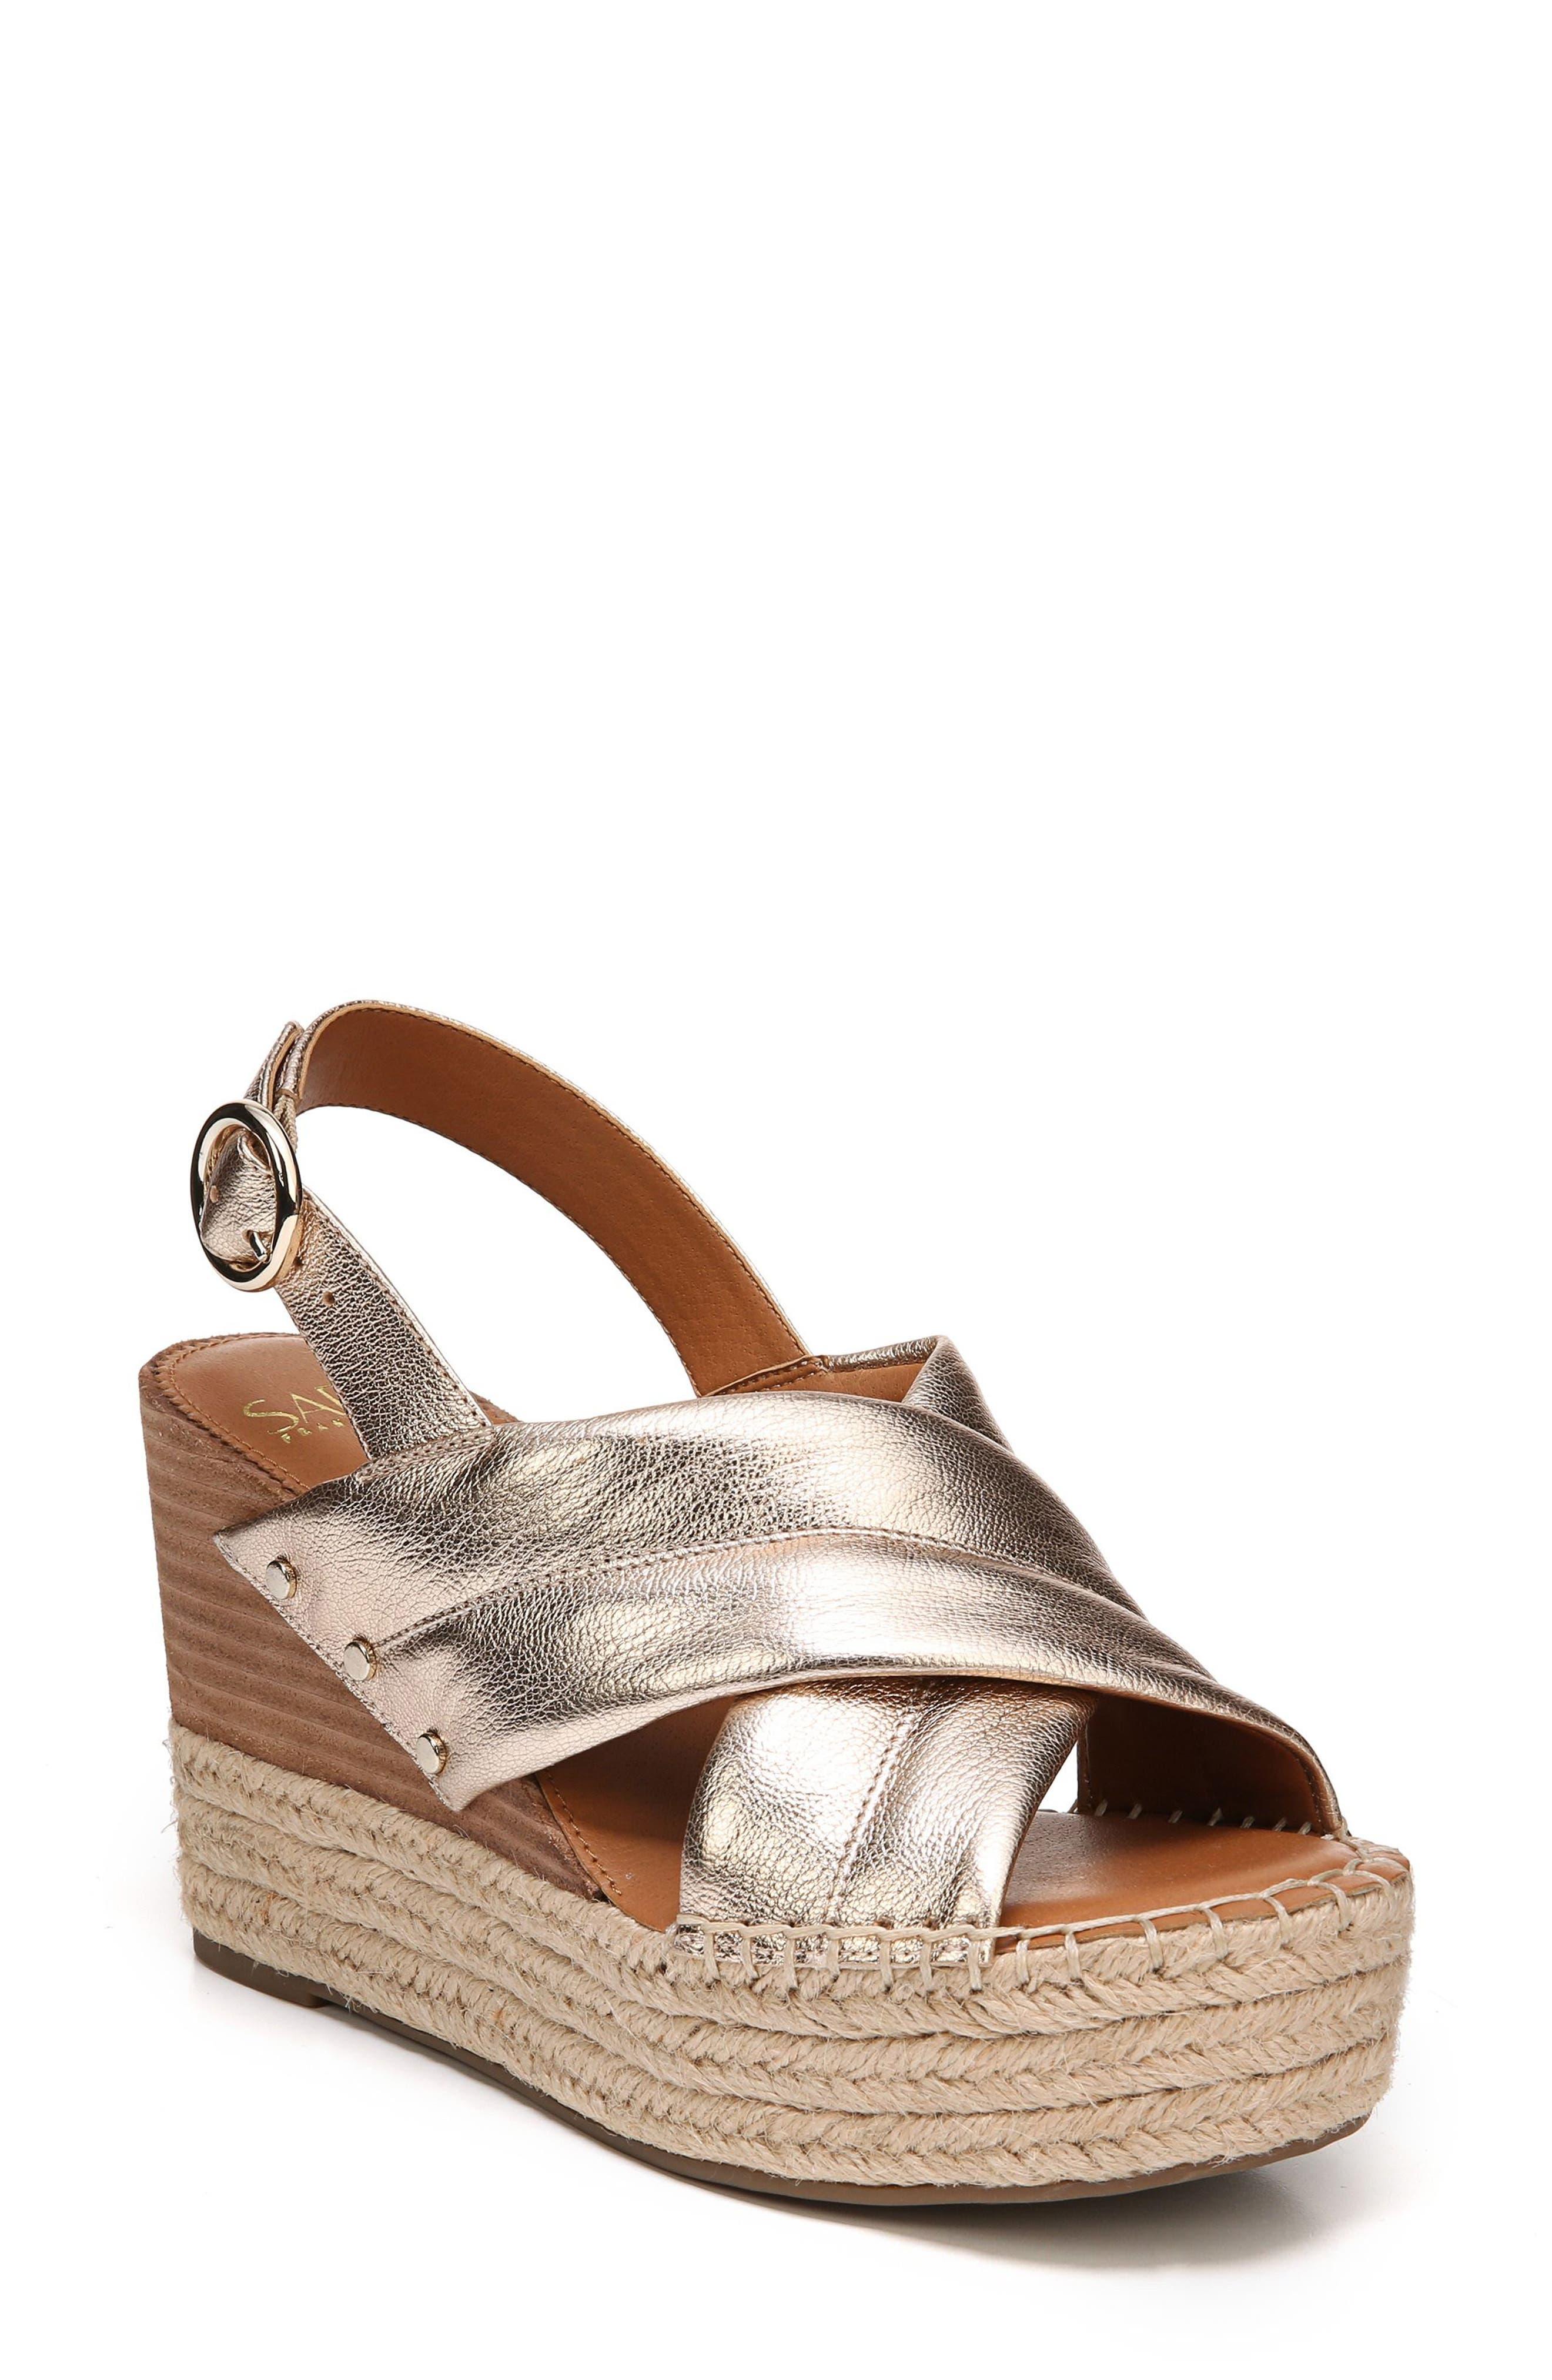 Niva Espadrille Wedge Sandal,                             Main thumbnail 5, color,